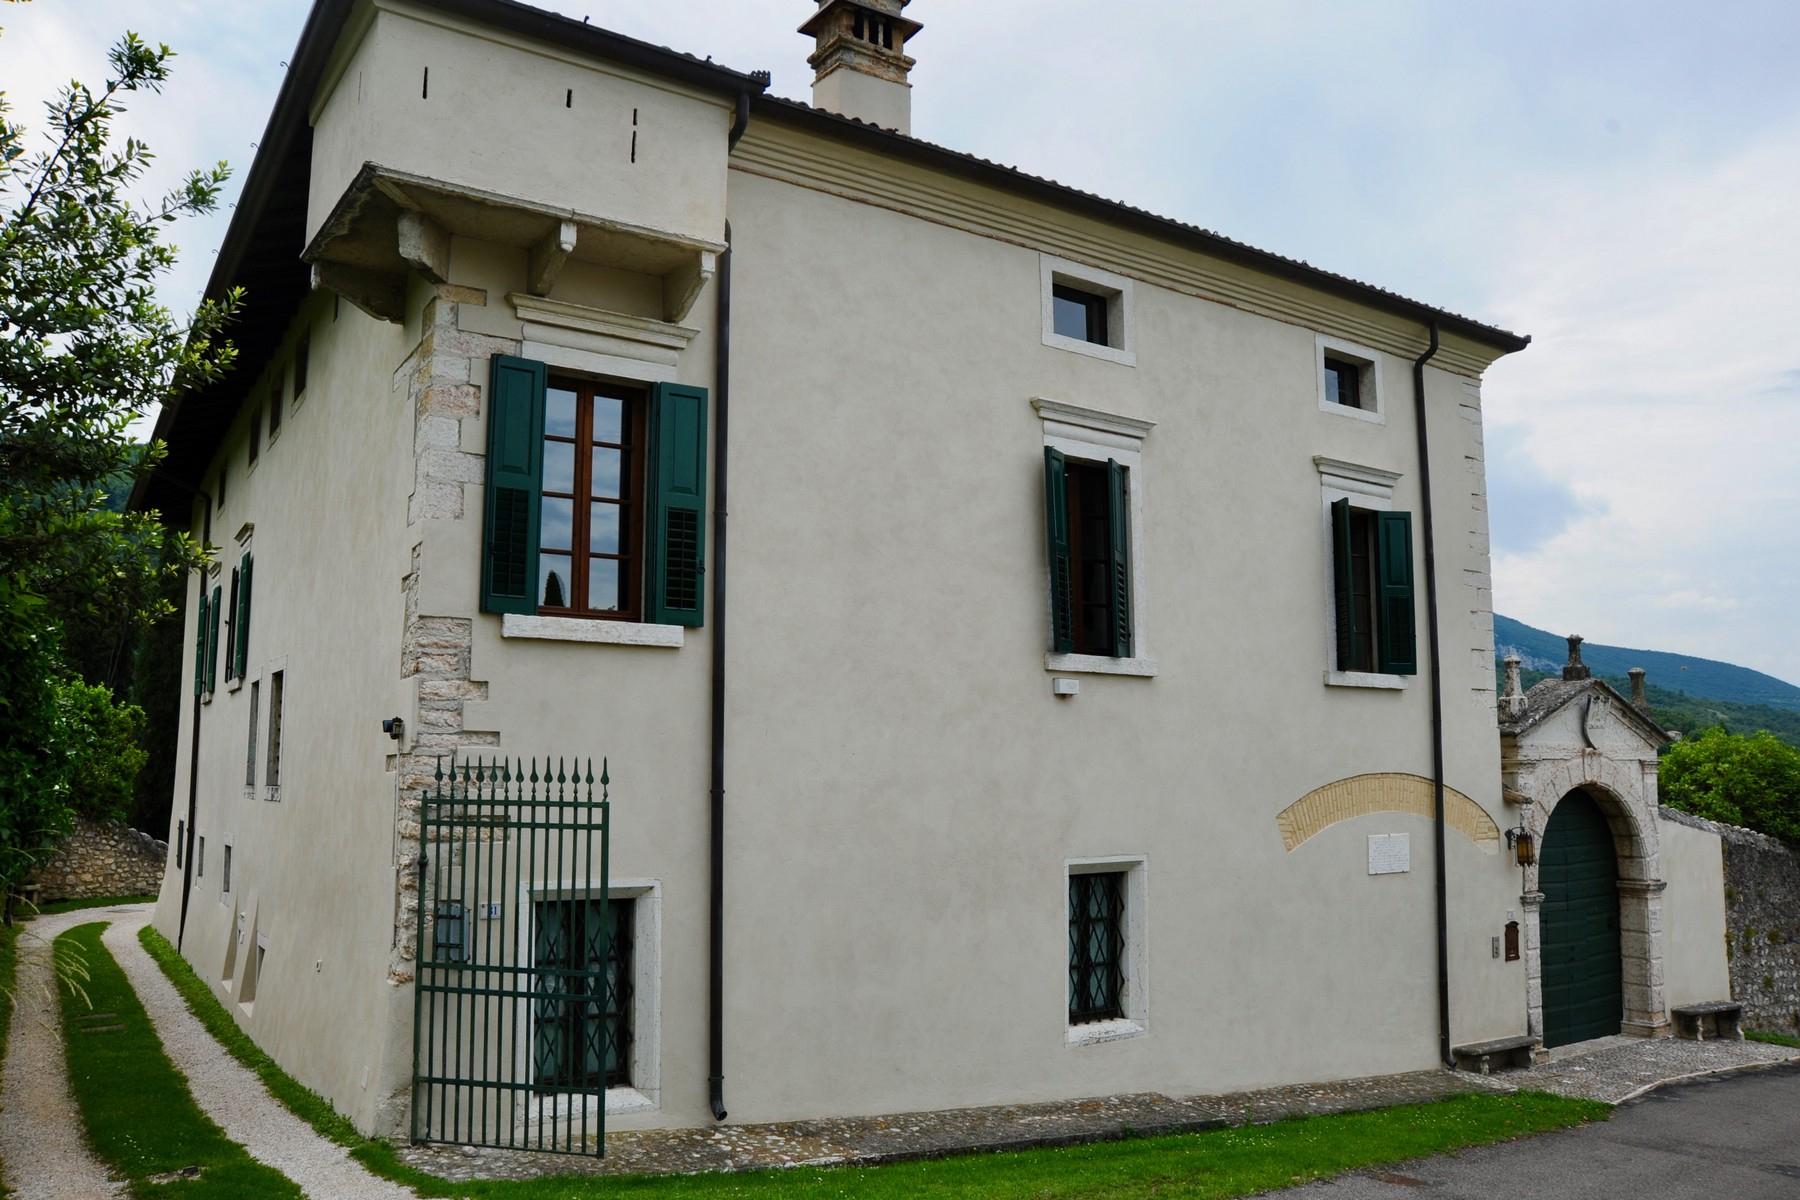 Villa in Vendita a Verona: 5 locali, 450 mq - Foto 18